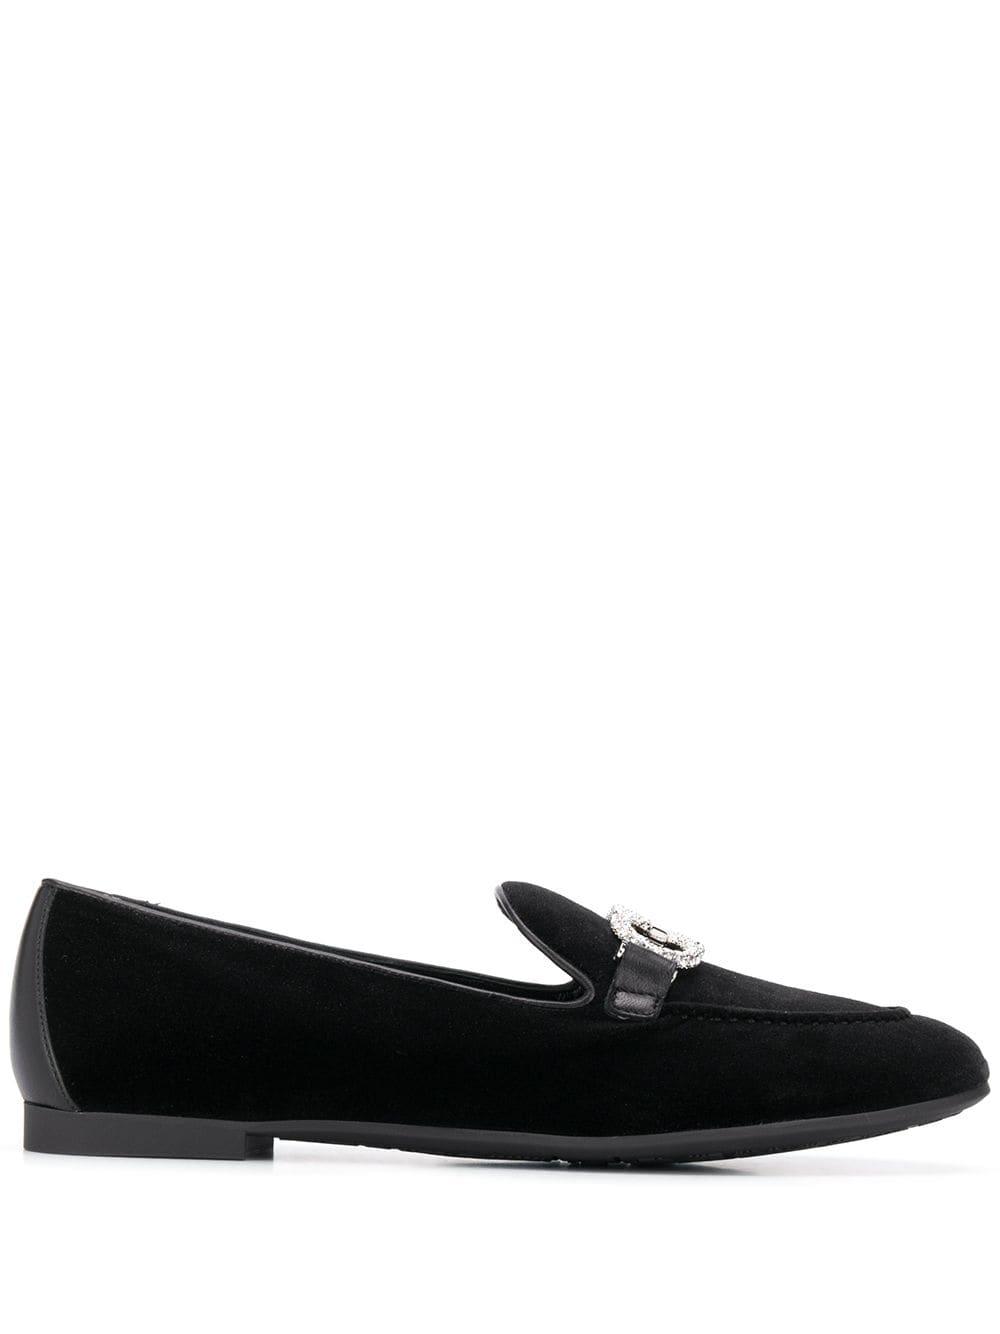 Trifoglio* Velvet Loafers